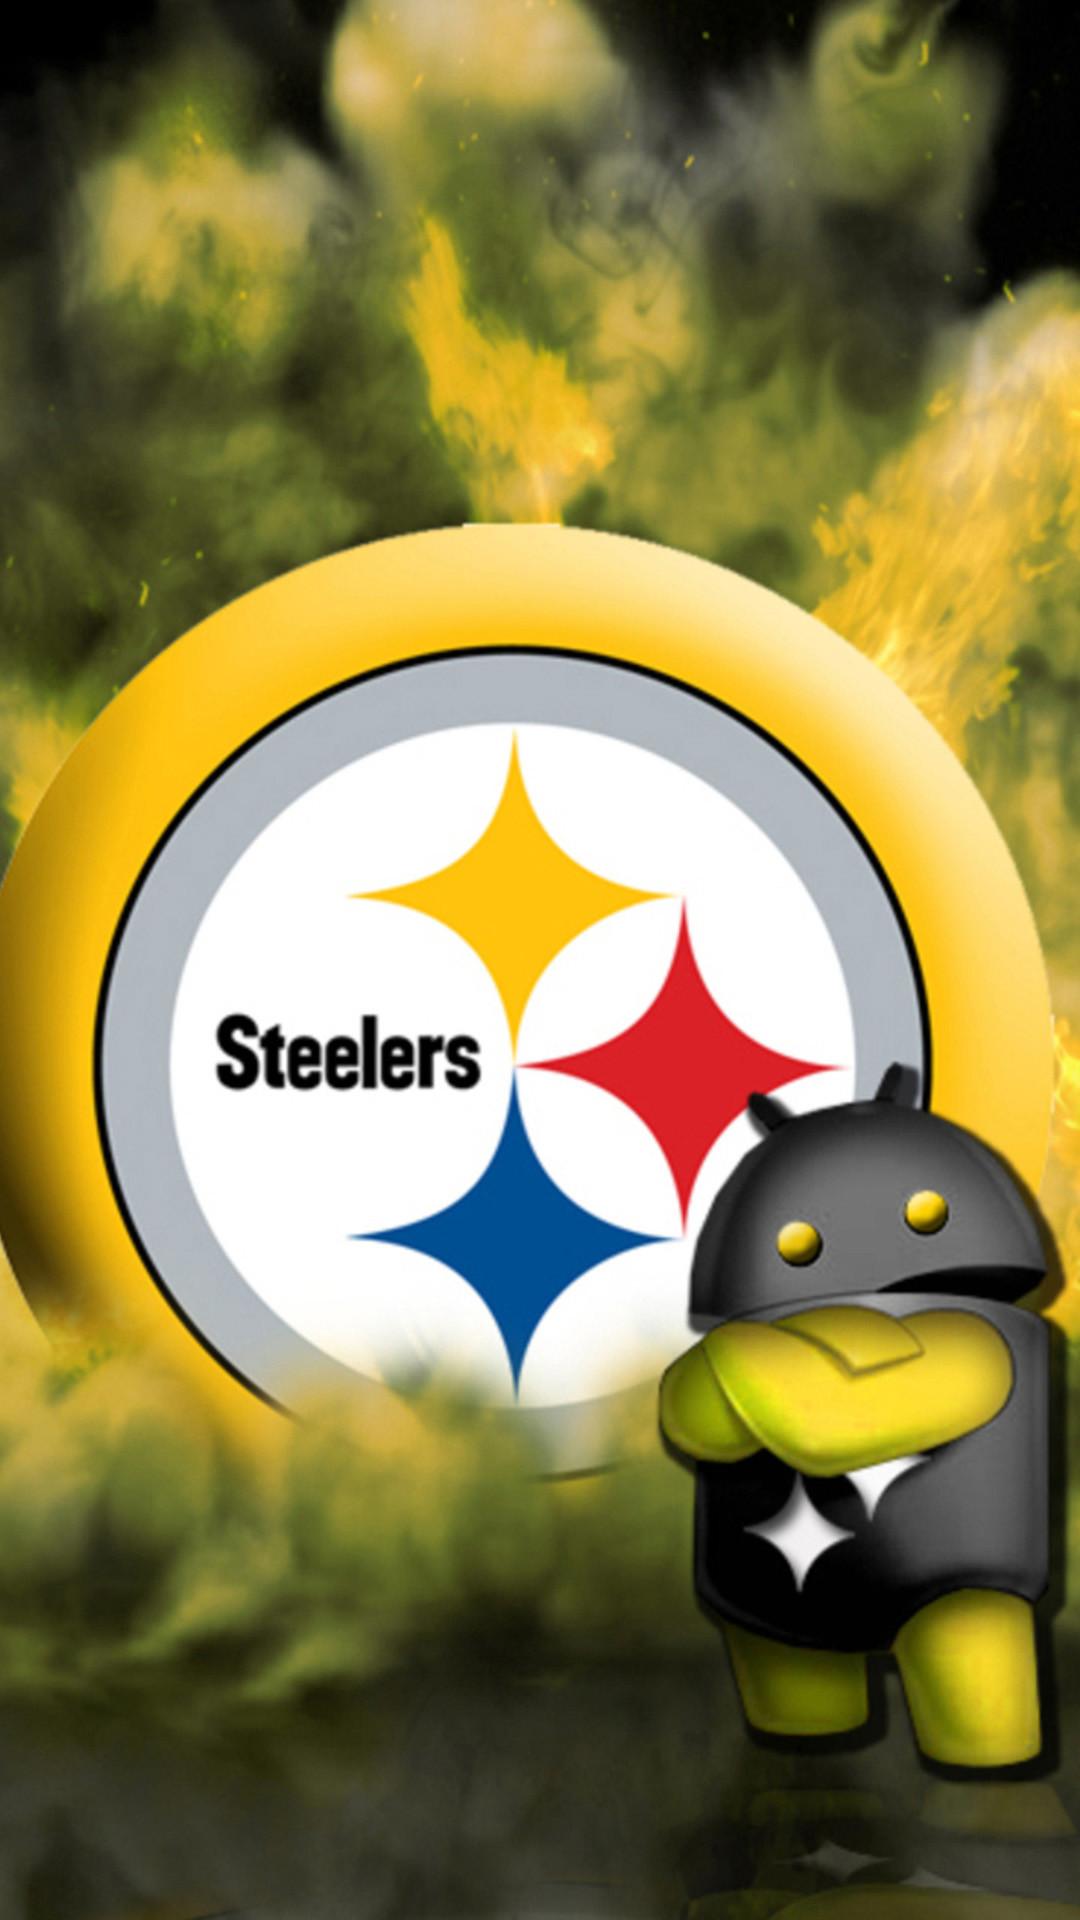 Wallpaper Steelers